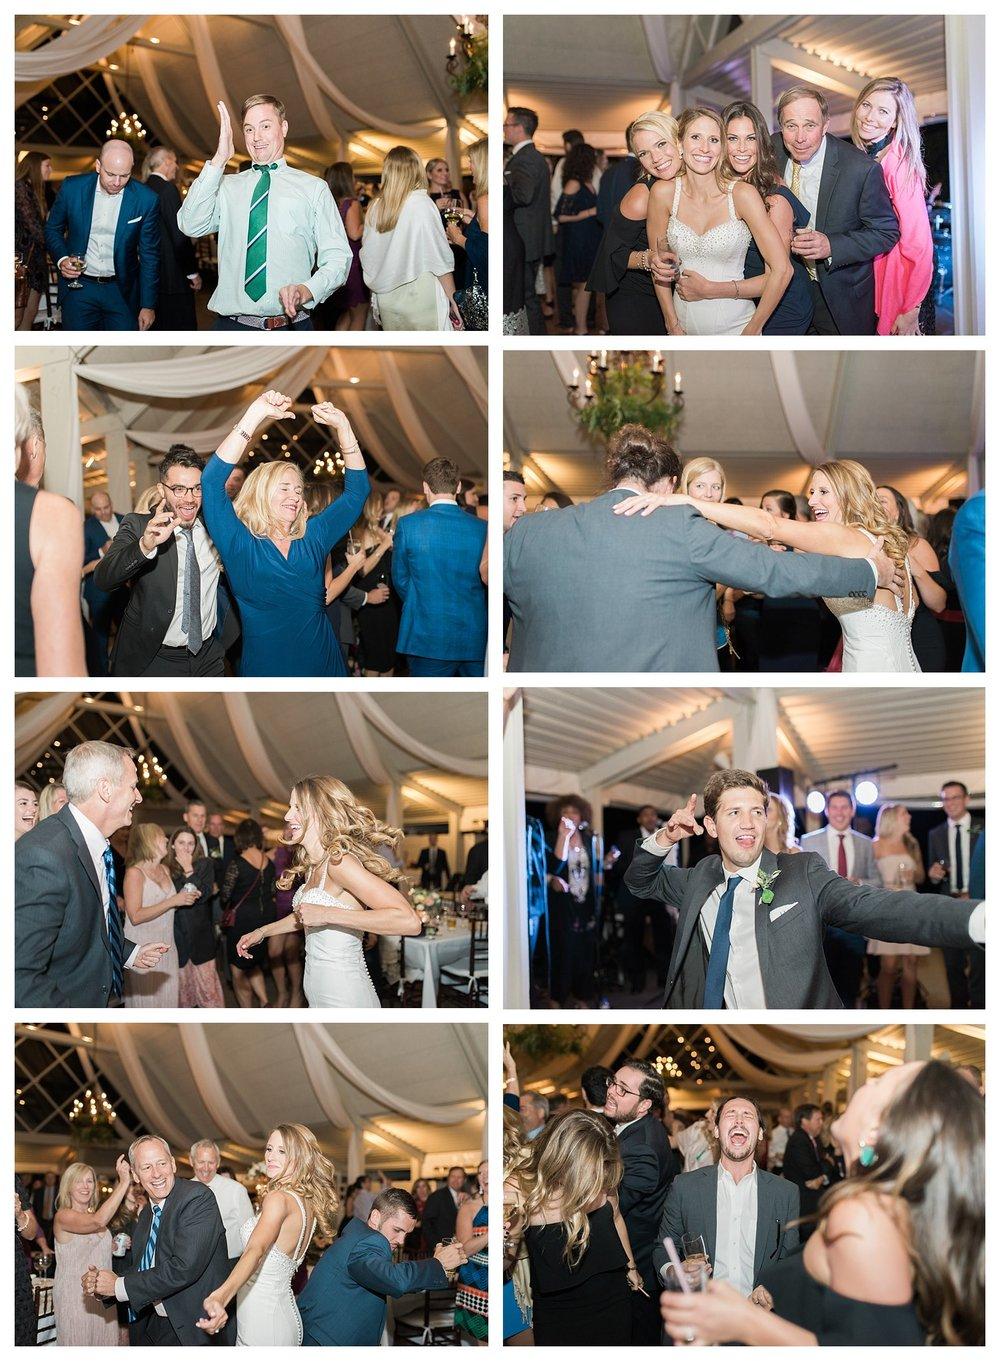 everleighphotography-cincinnati-wedding-photographer-northern-kentucky-wedding-photographer-camargo-country-club-the-karsh-wedding-74